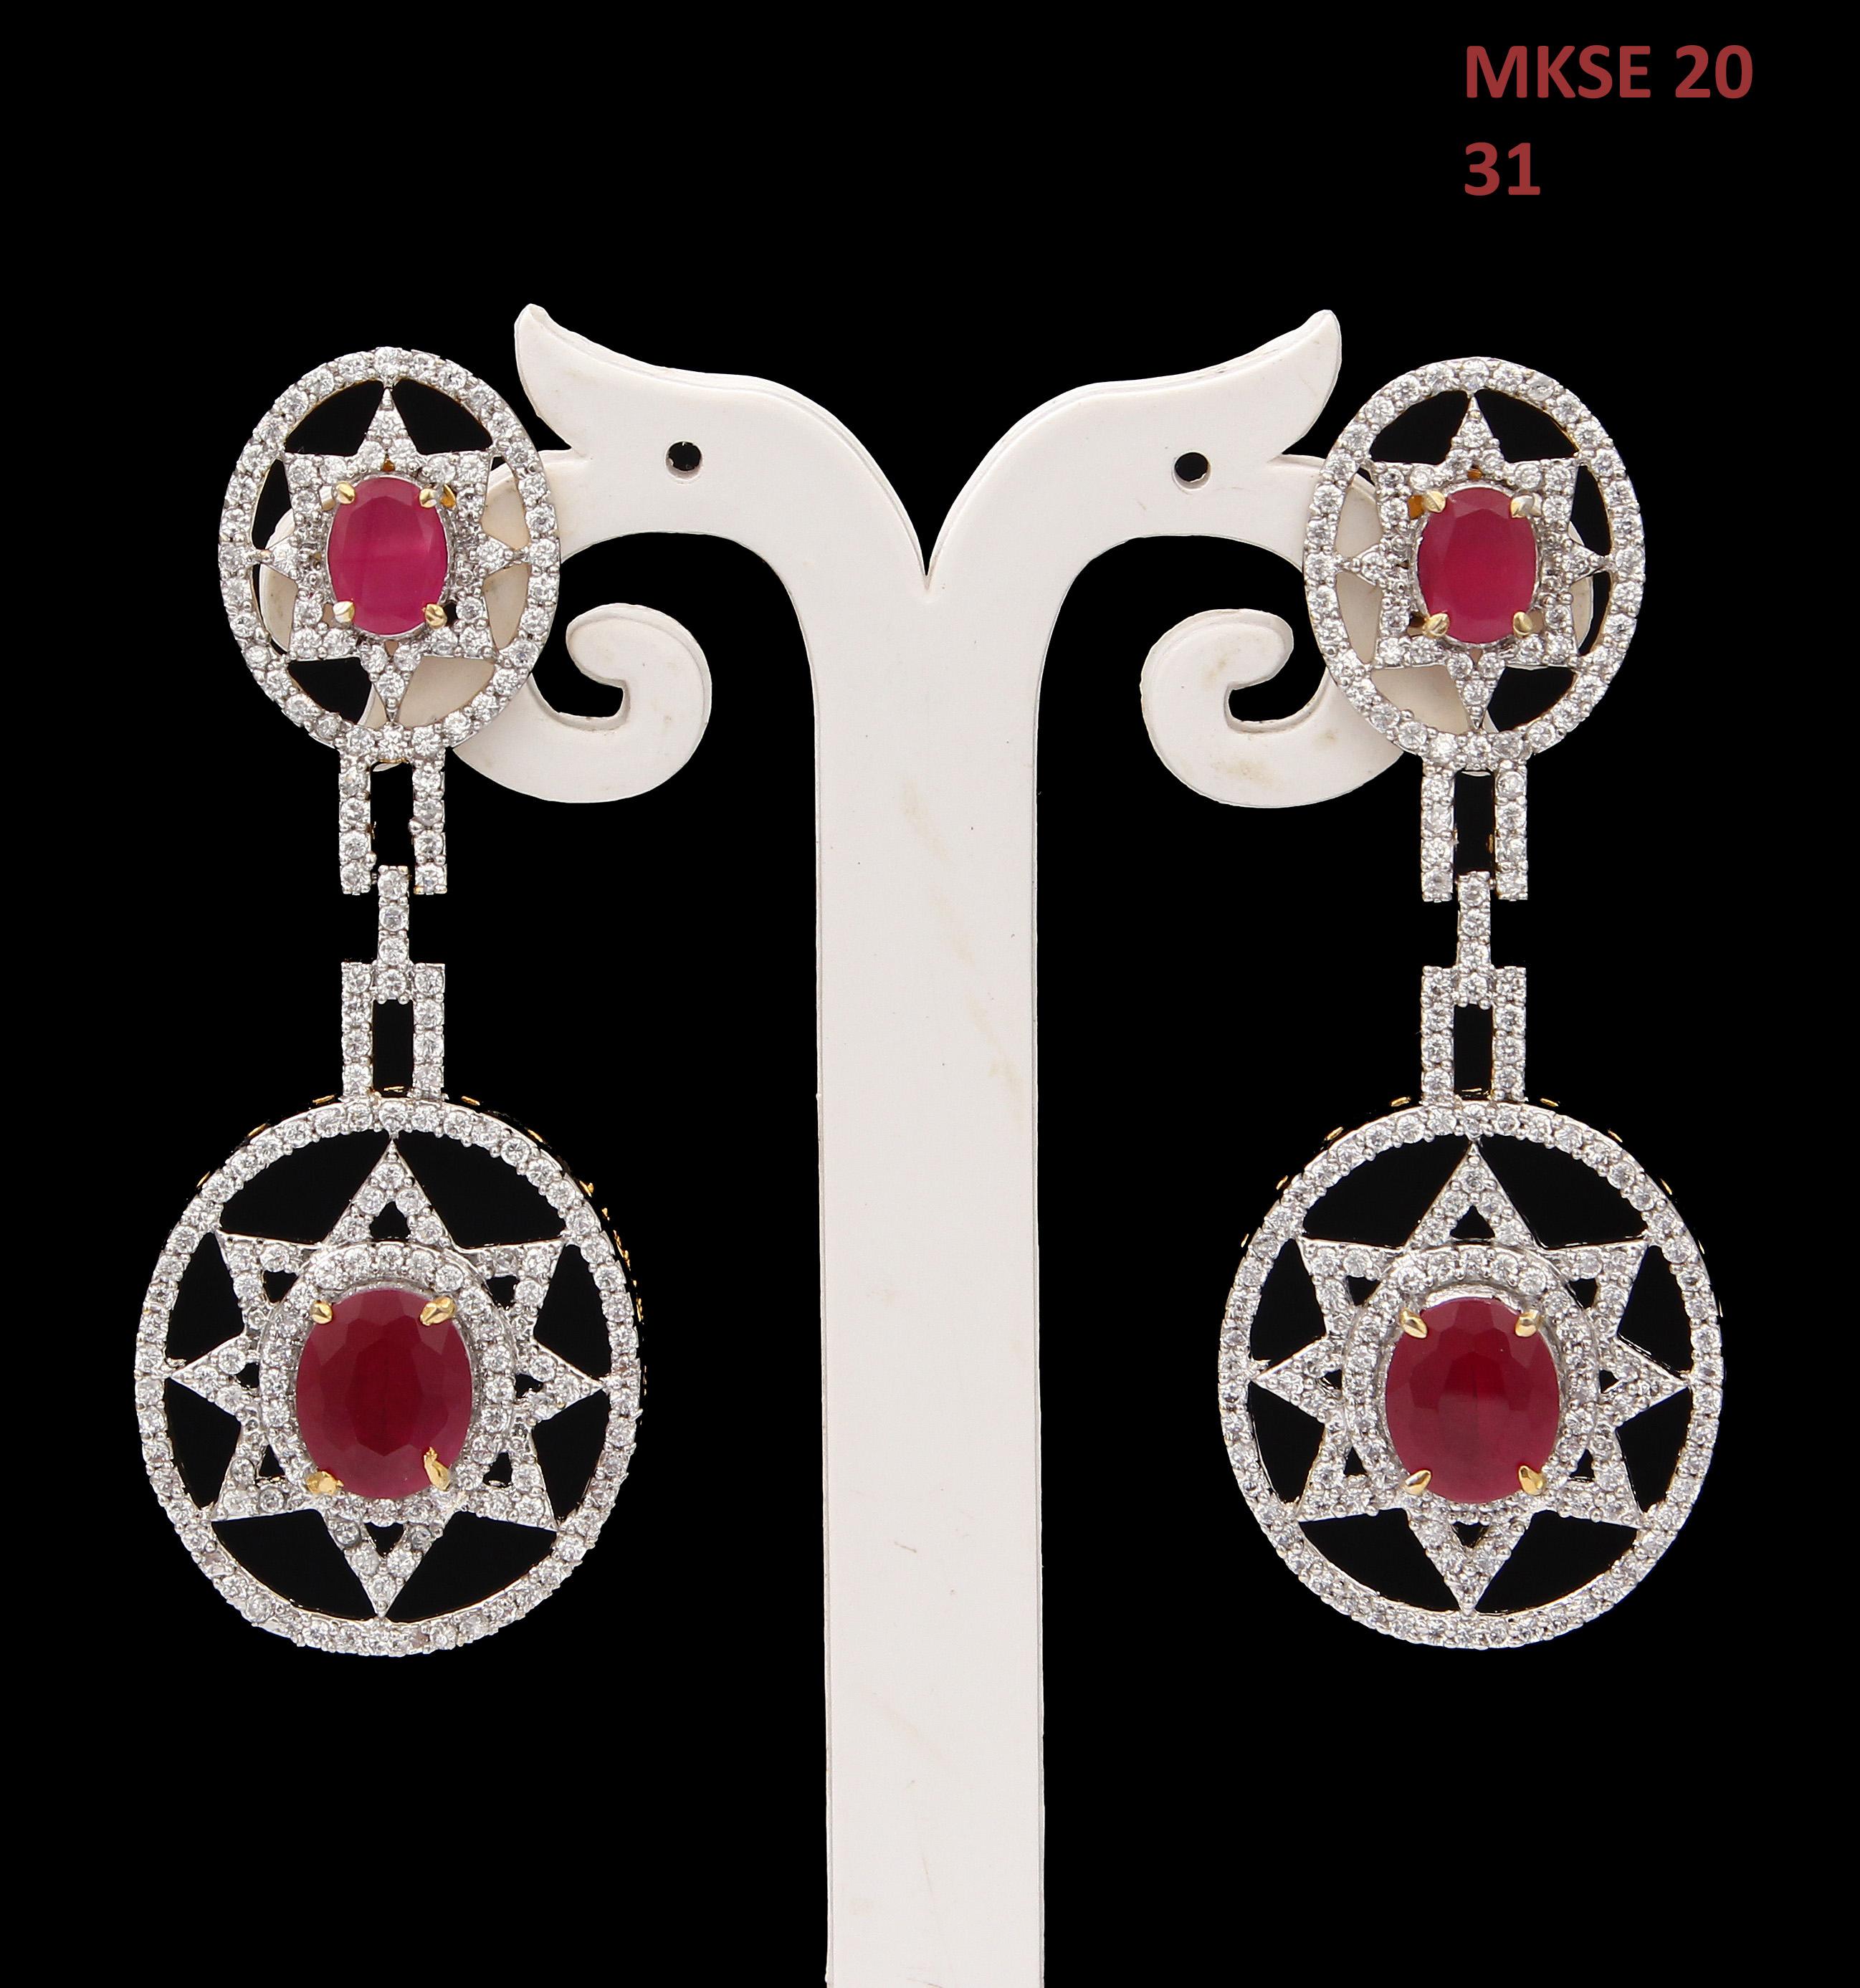 55Carat   Handmade Drop & Dangle Earrings For Womens Ruby,Cubic Zircon Stones Gold Plated Cluster Stud Bohemian Long Earings For Girls Lightweight Indian Fashion Jewellery